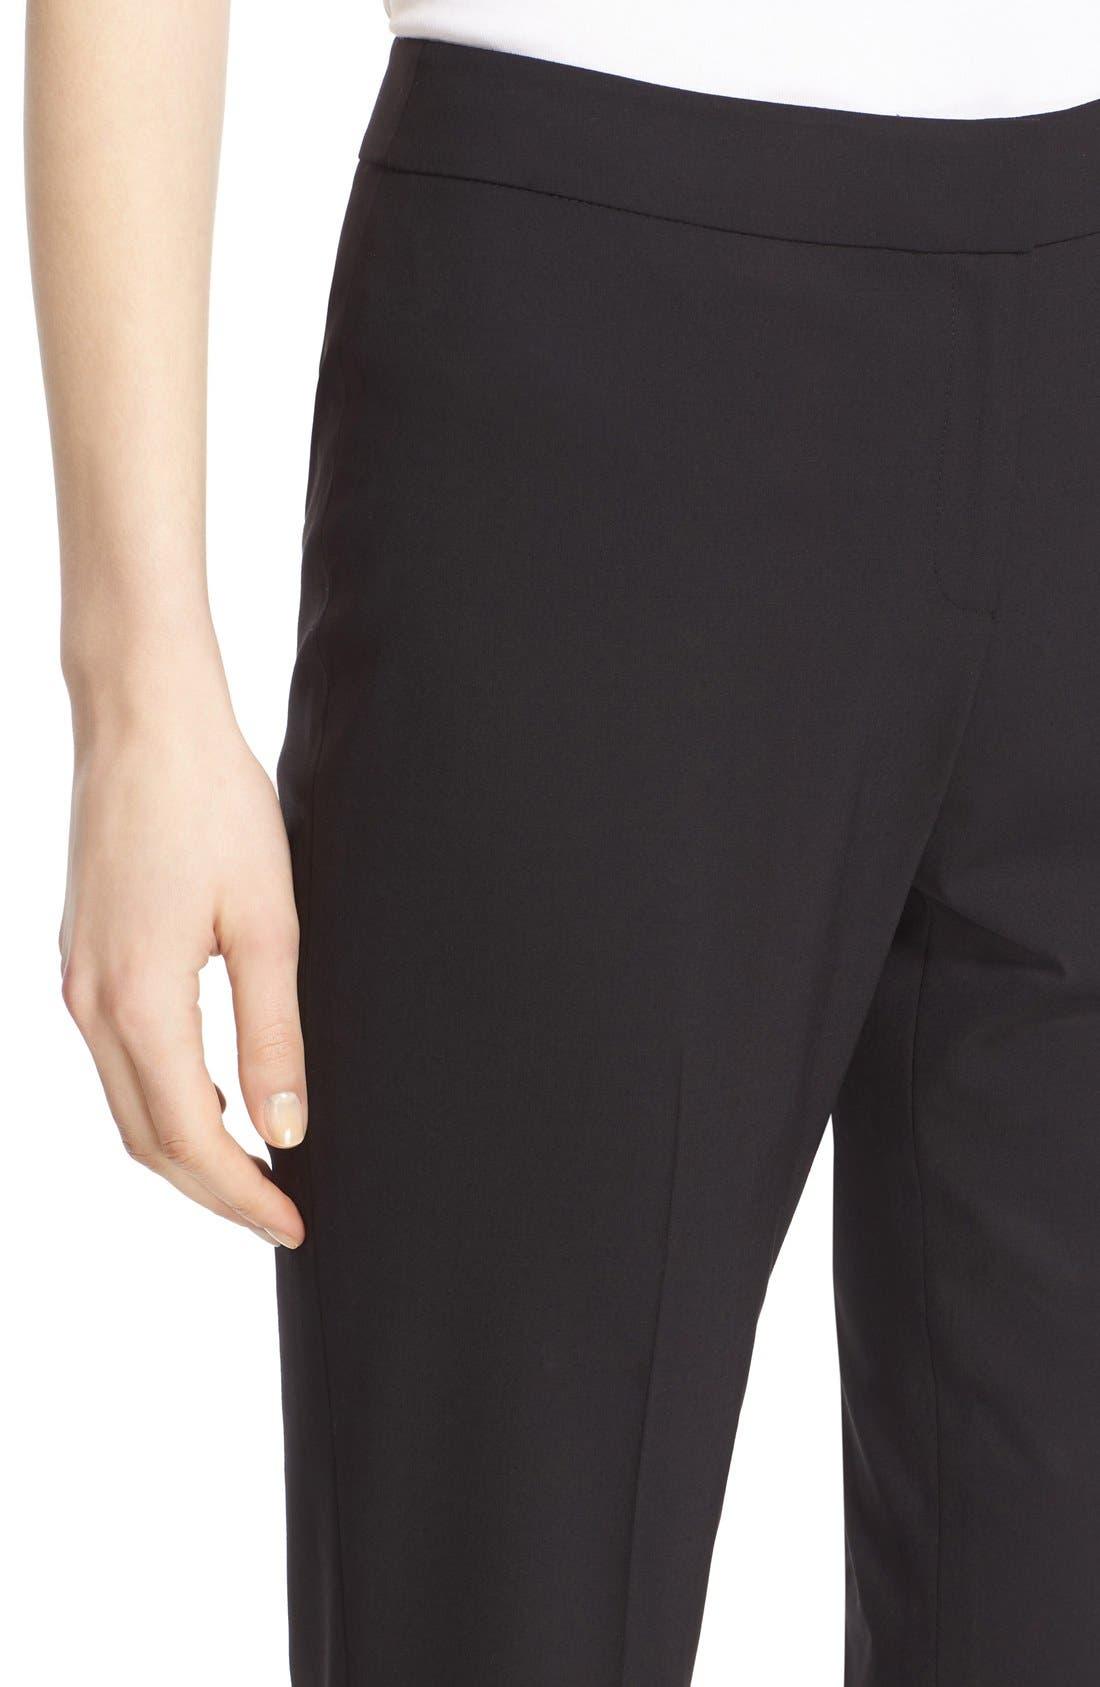 Barrow Stretch Wool Pants,                             Alternate thumbnail 11, color,                             BLACK